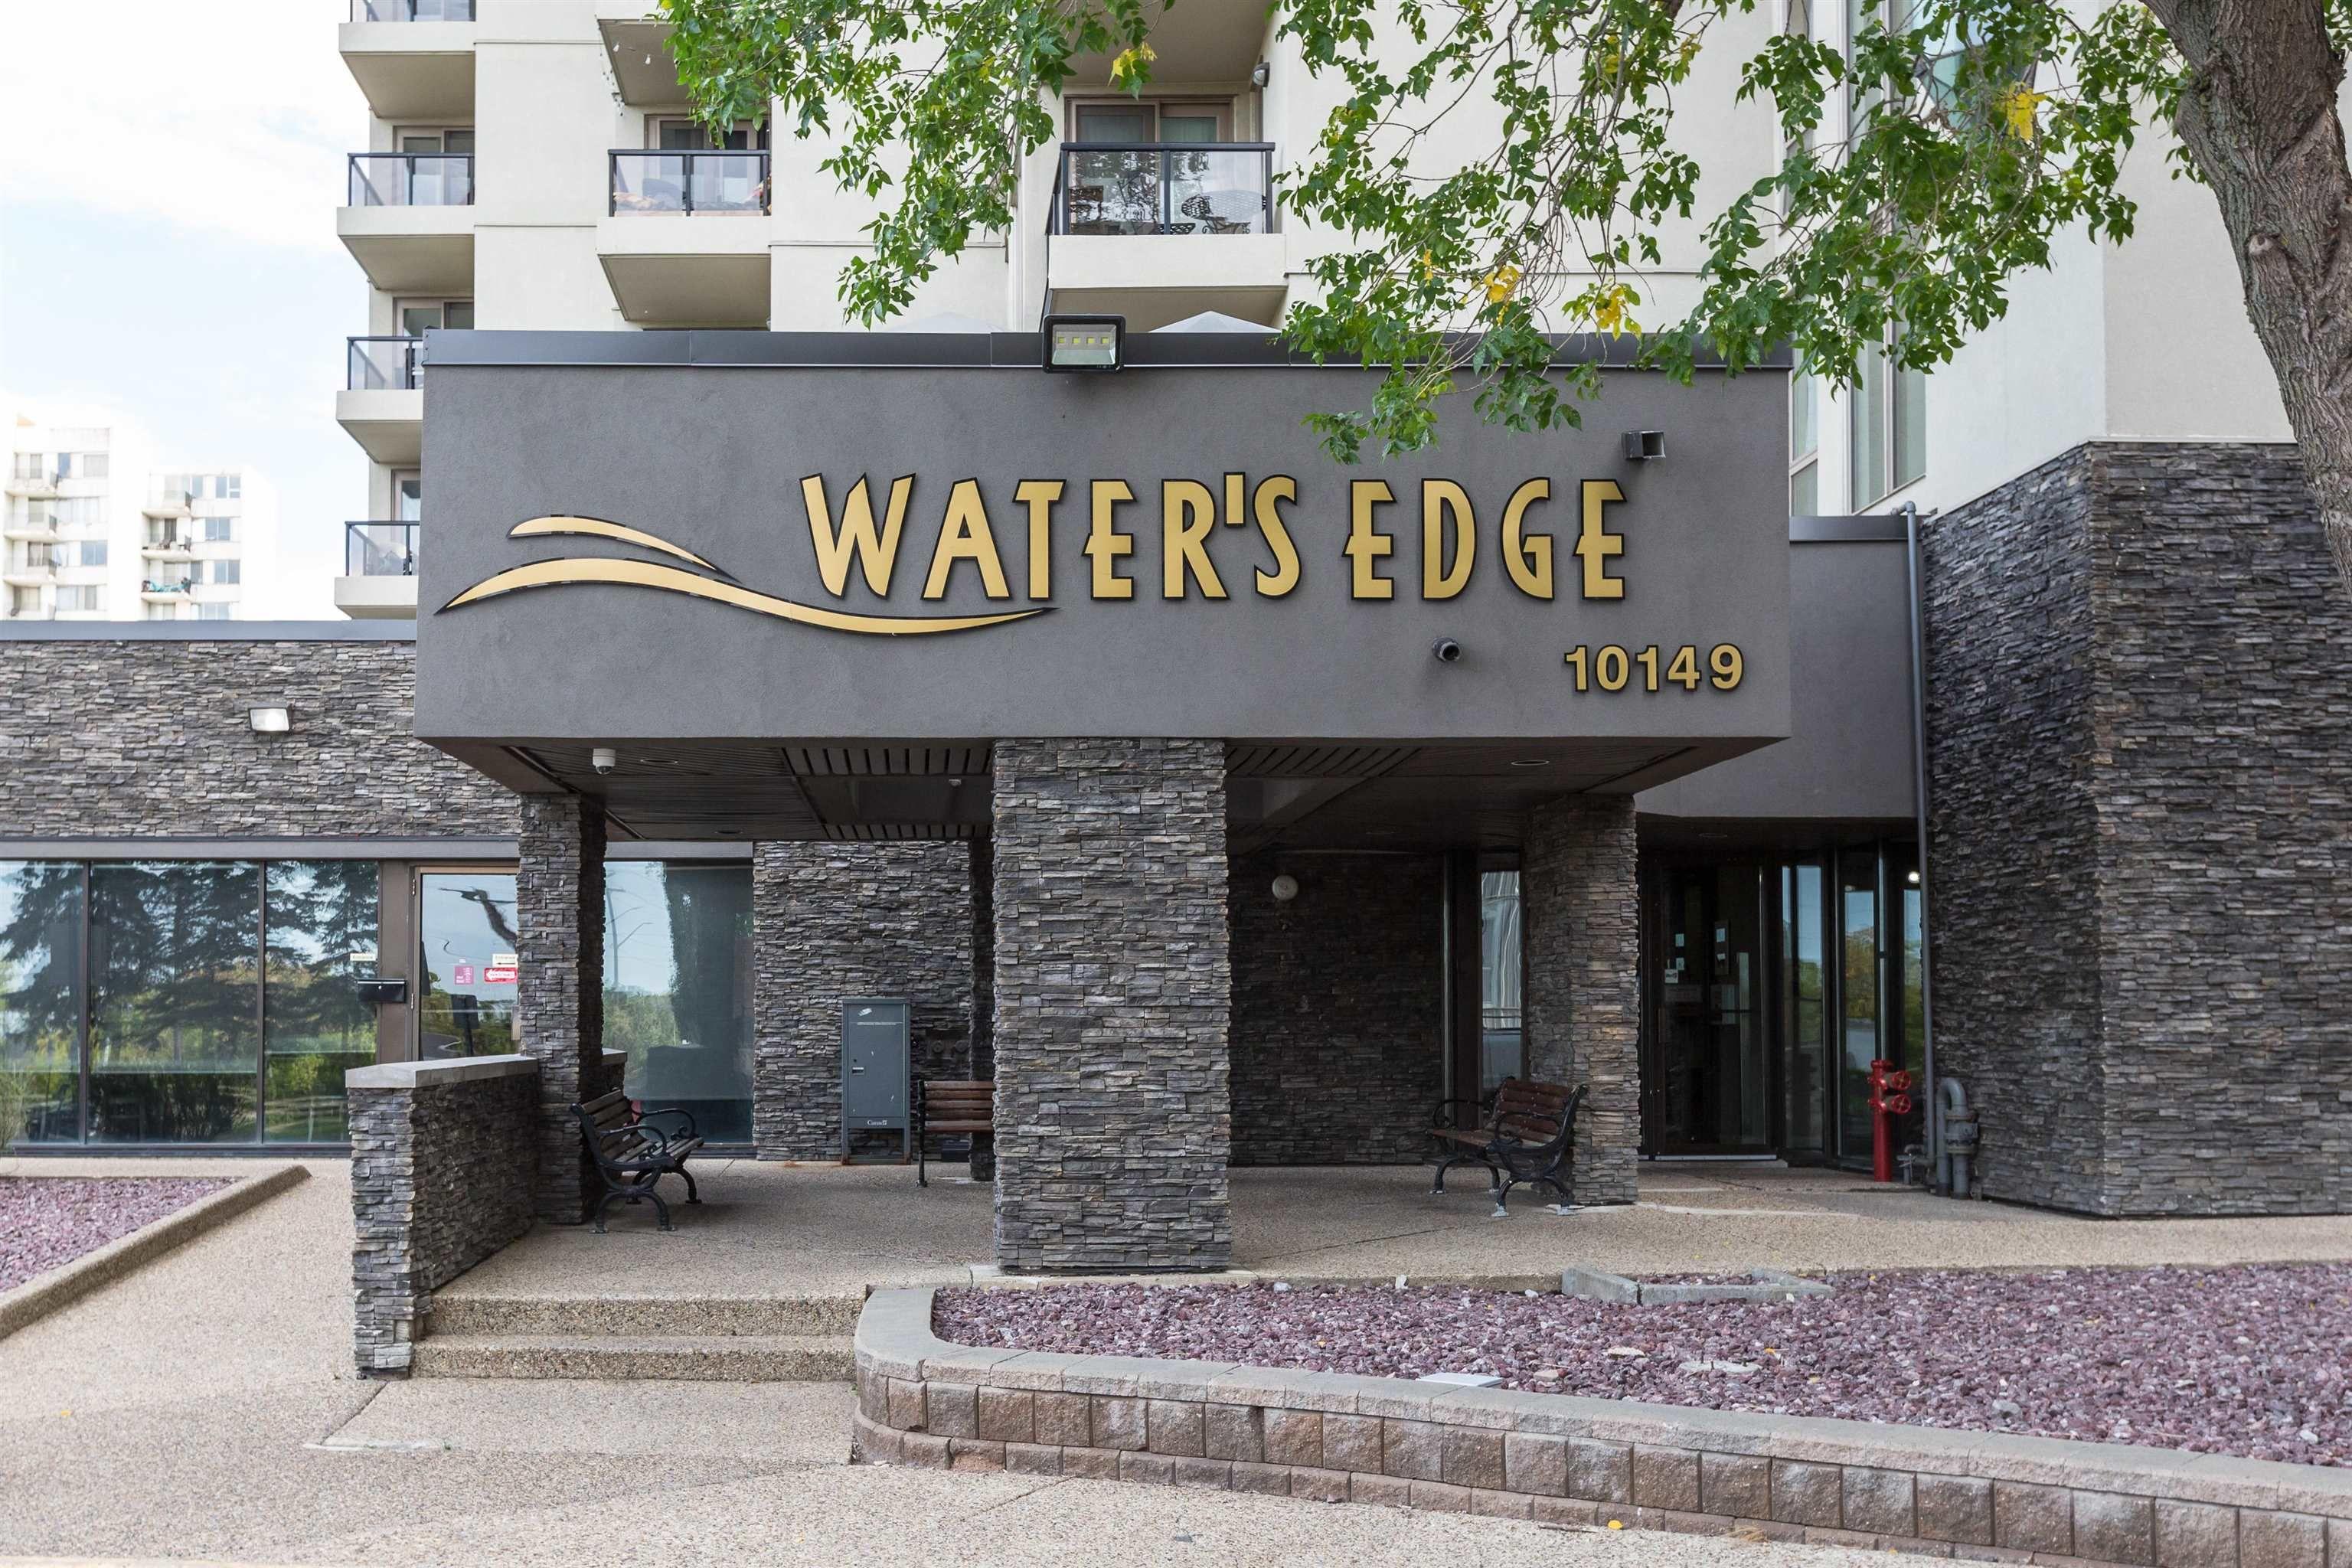 Main Photo: 410 10149 Saskatchewan Drive in Edmonton: Zone 15 Condo for sale : MLS®# E4262217